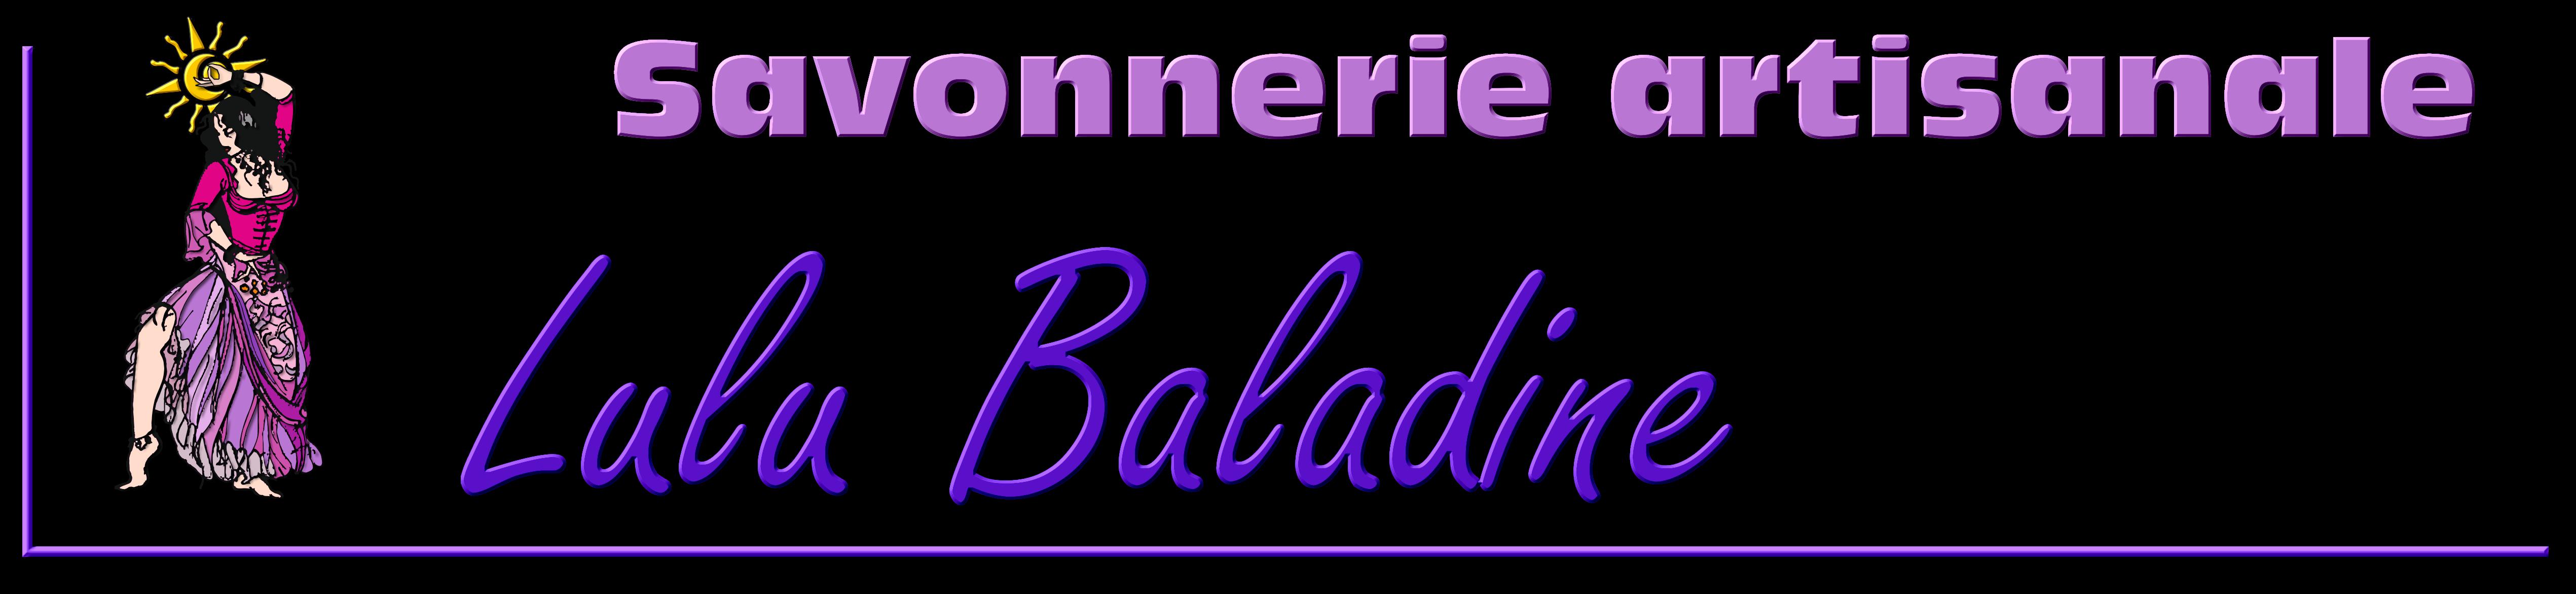 Lulu Baladine